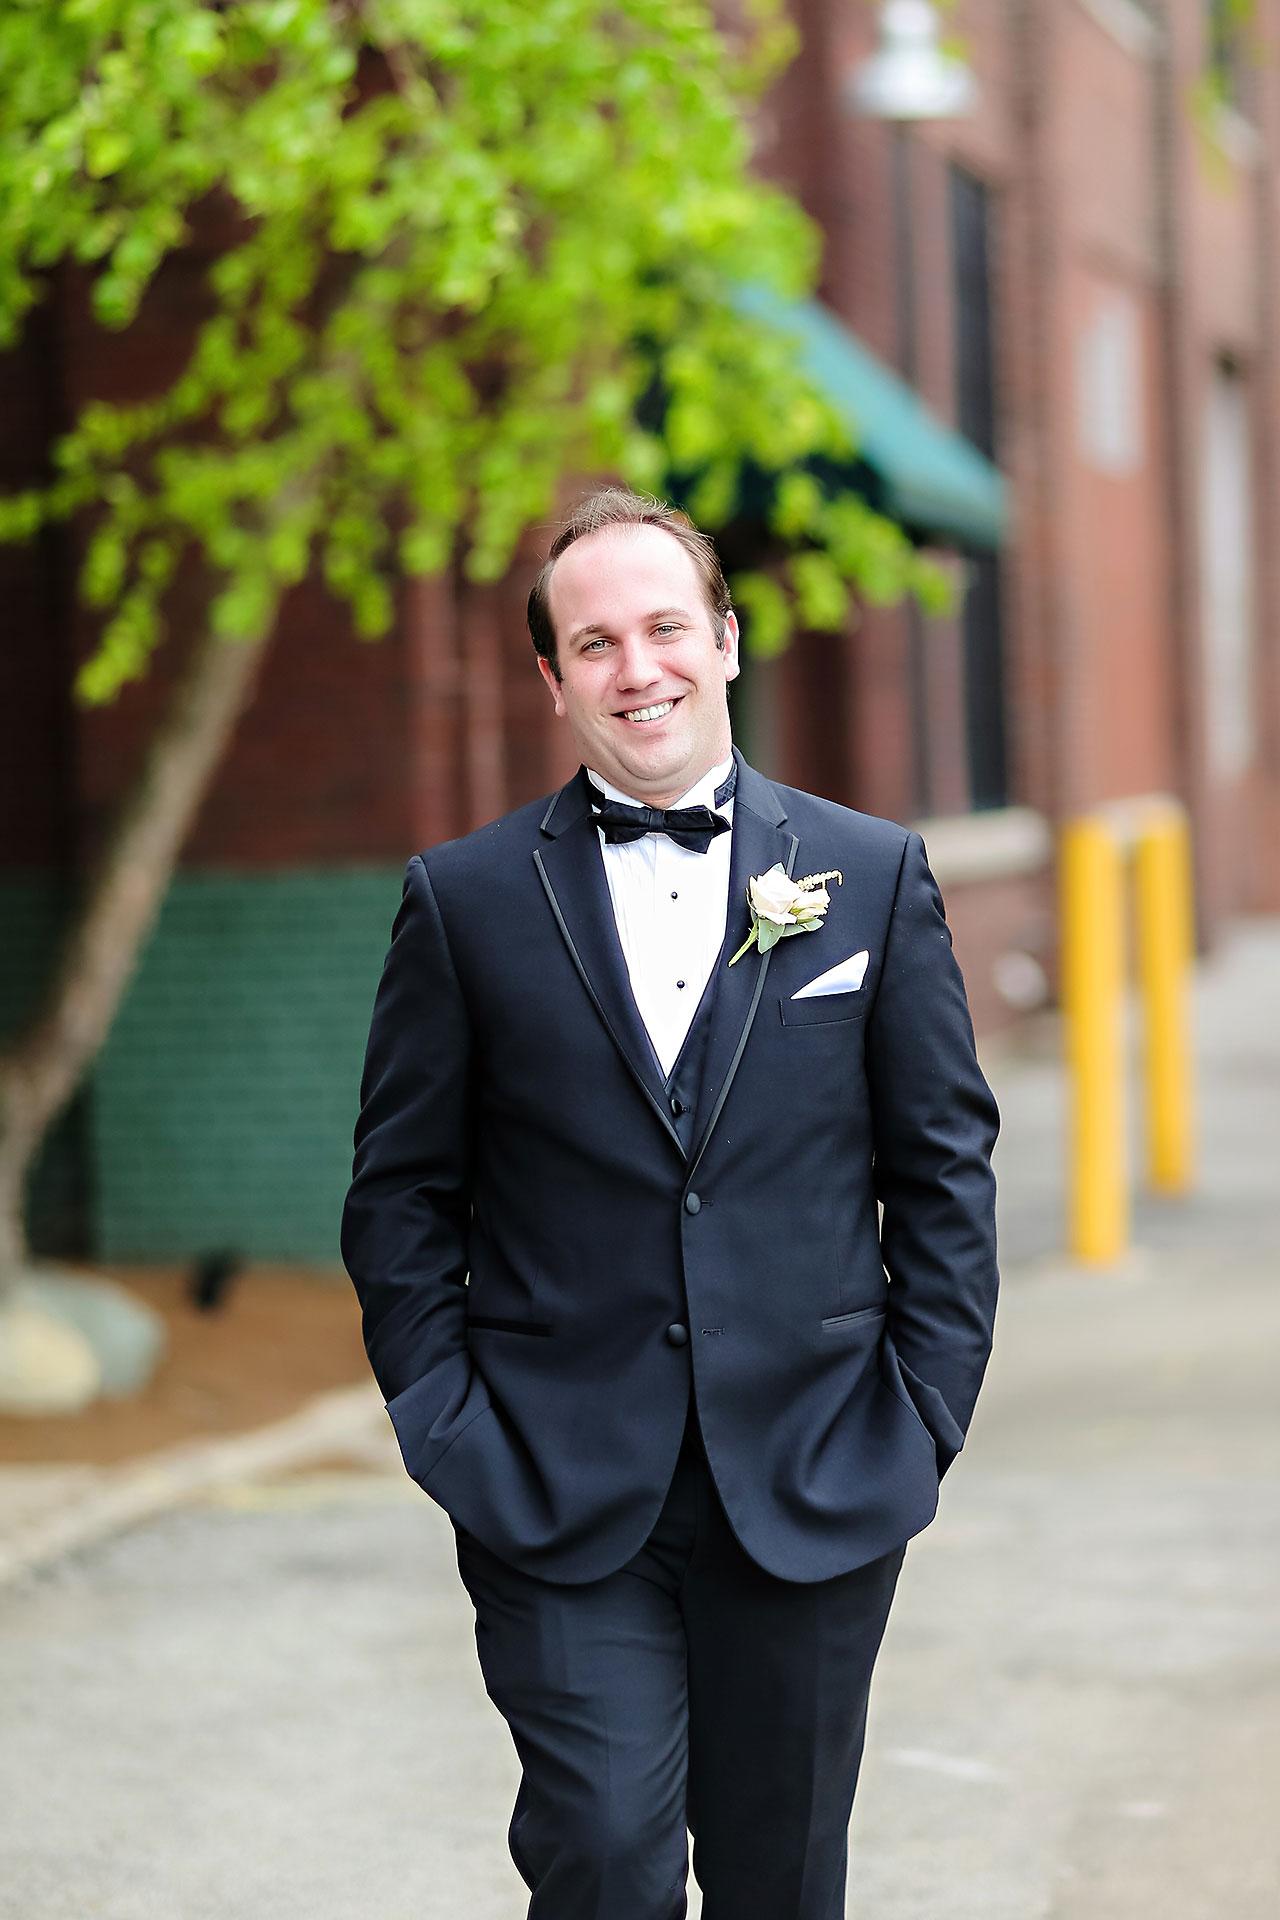 Allison Jeff Union Station Crowne Plaza Indianapolis wedding 164